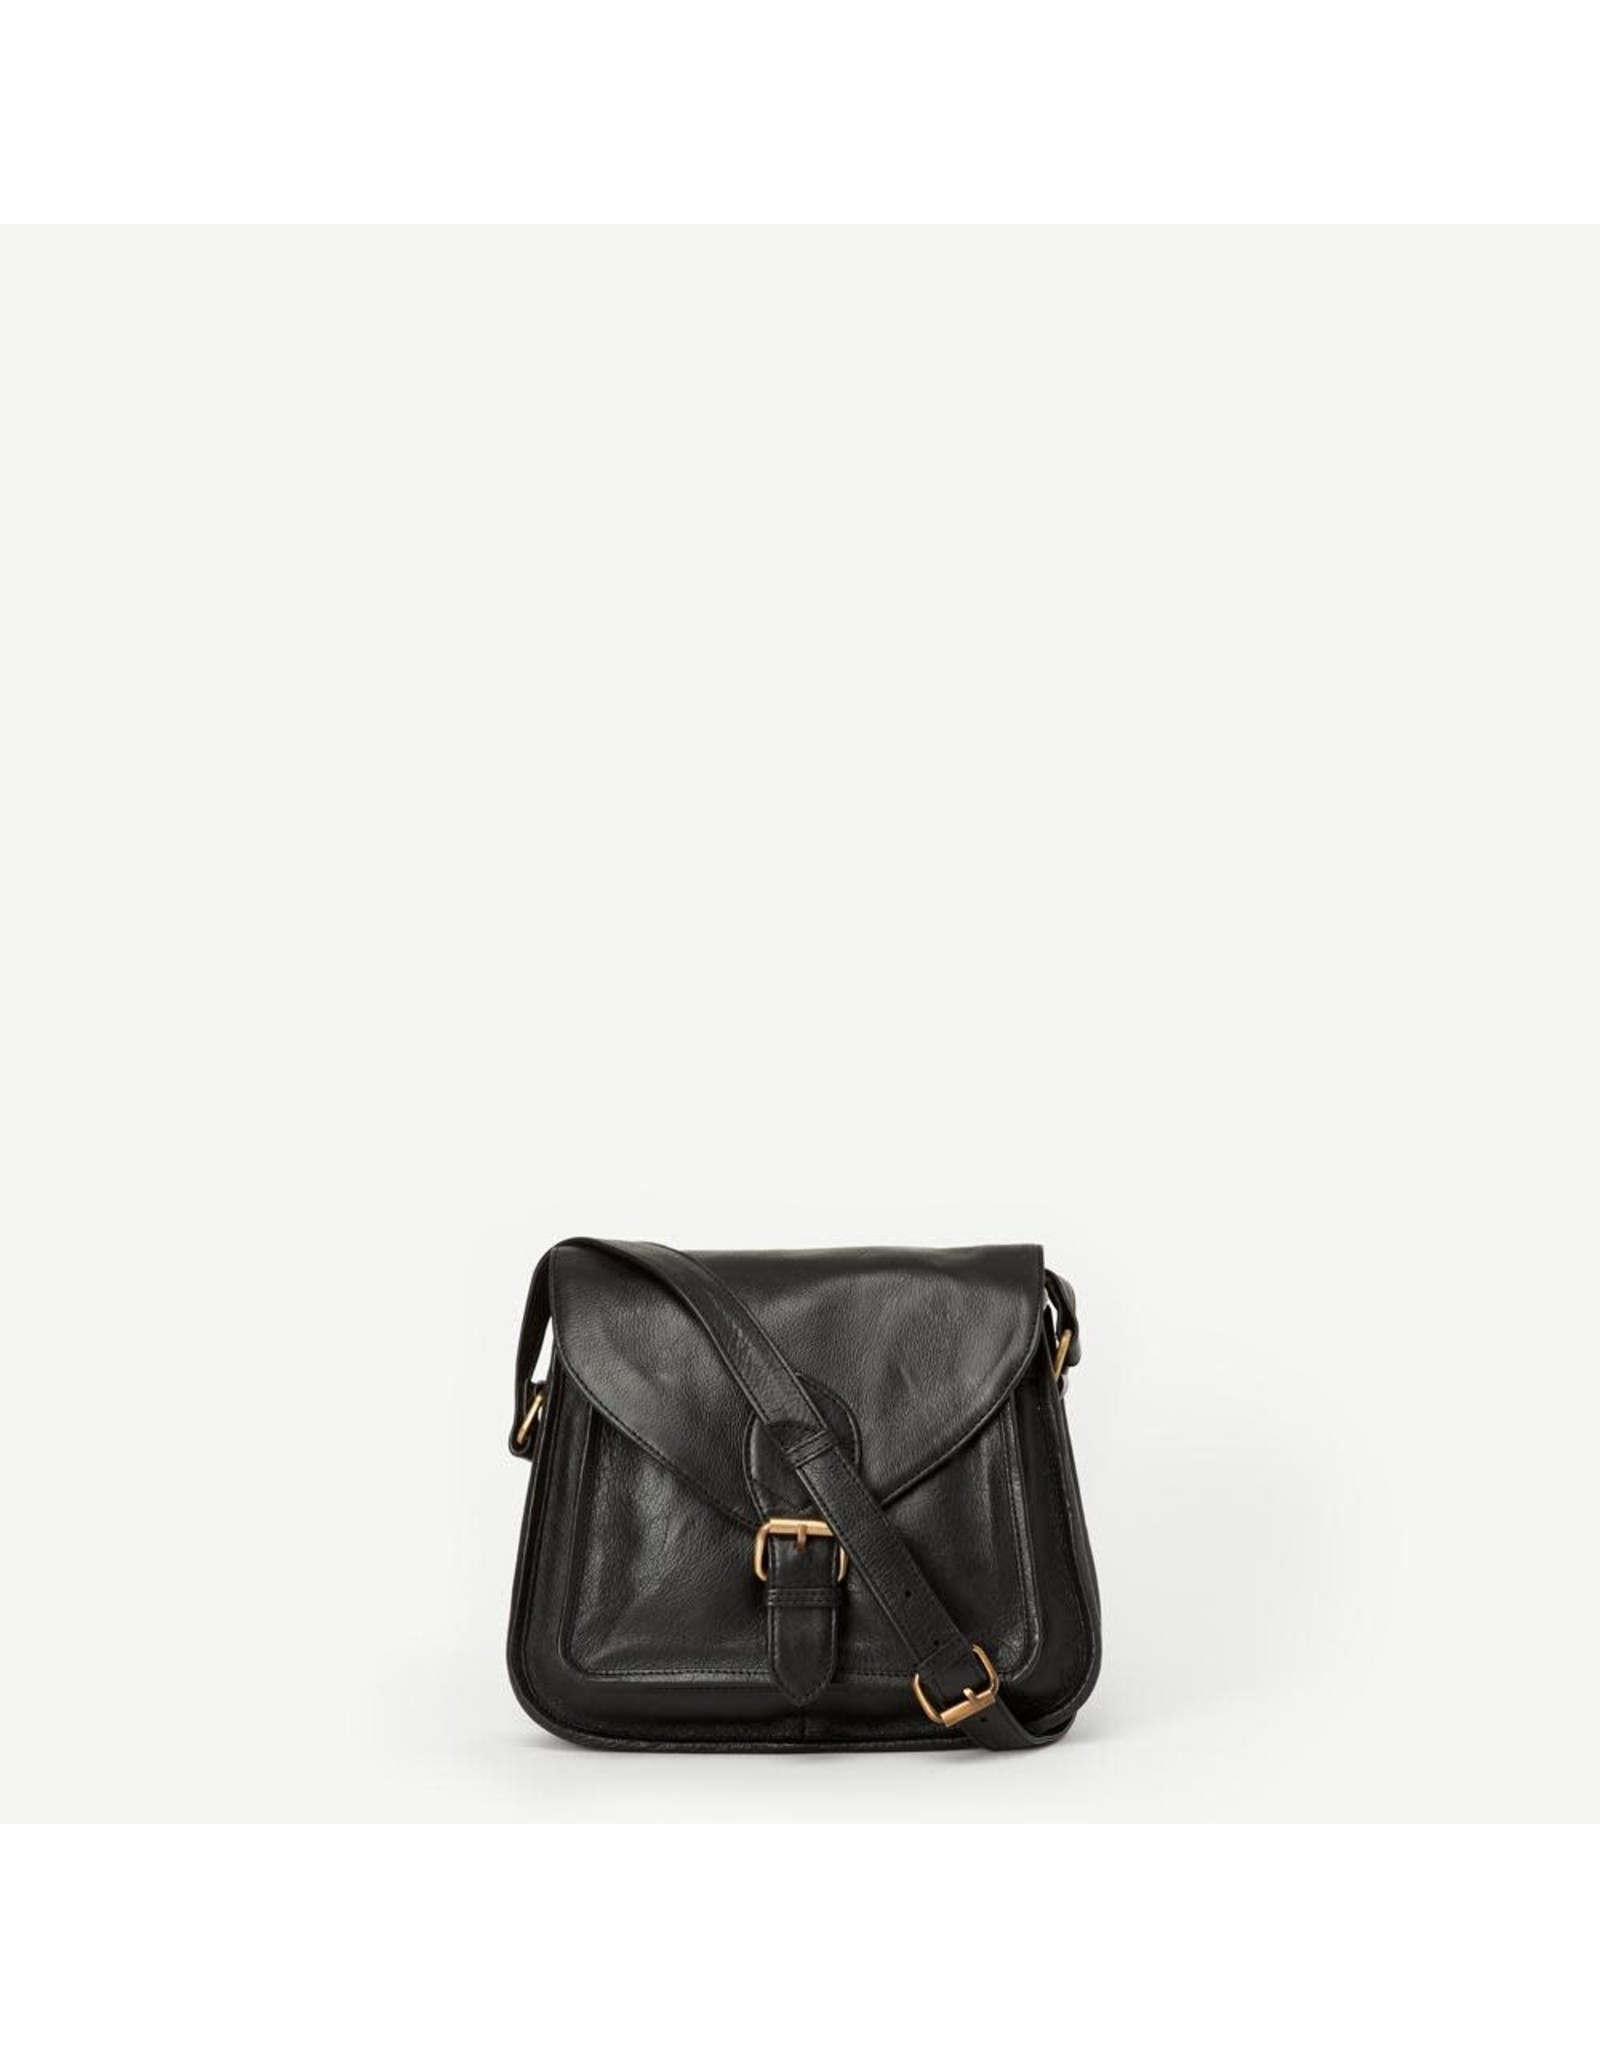 Myra Black Leather Satchel